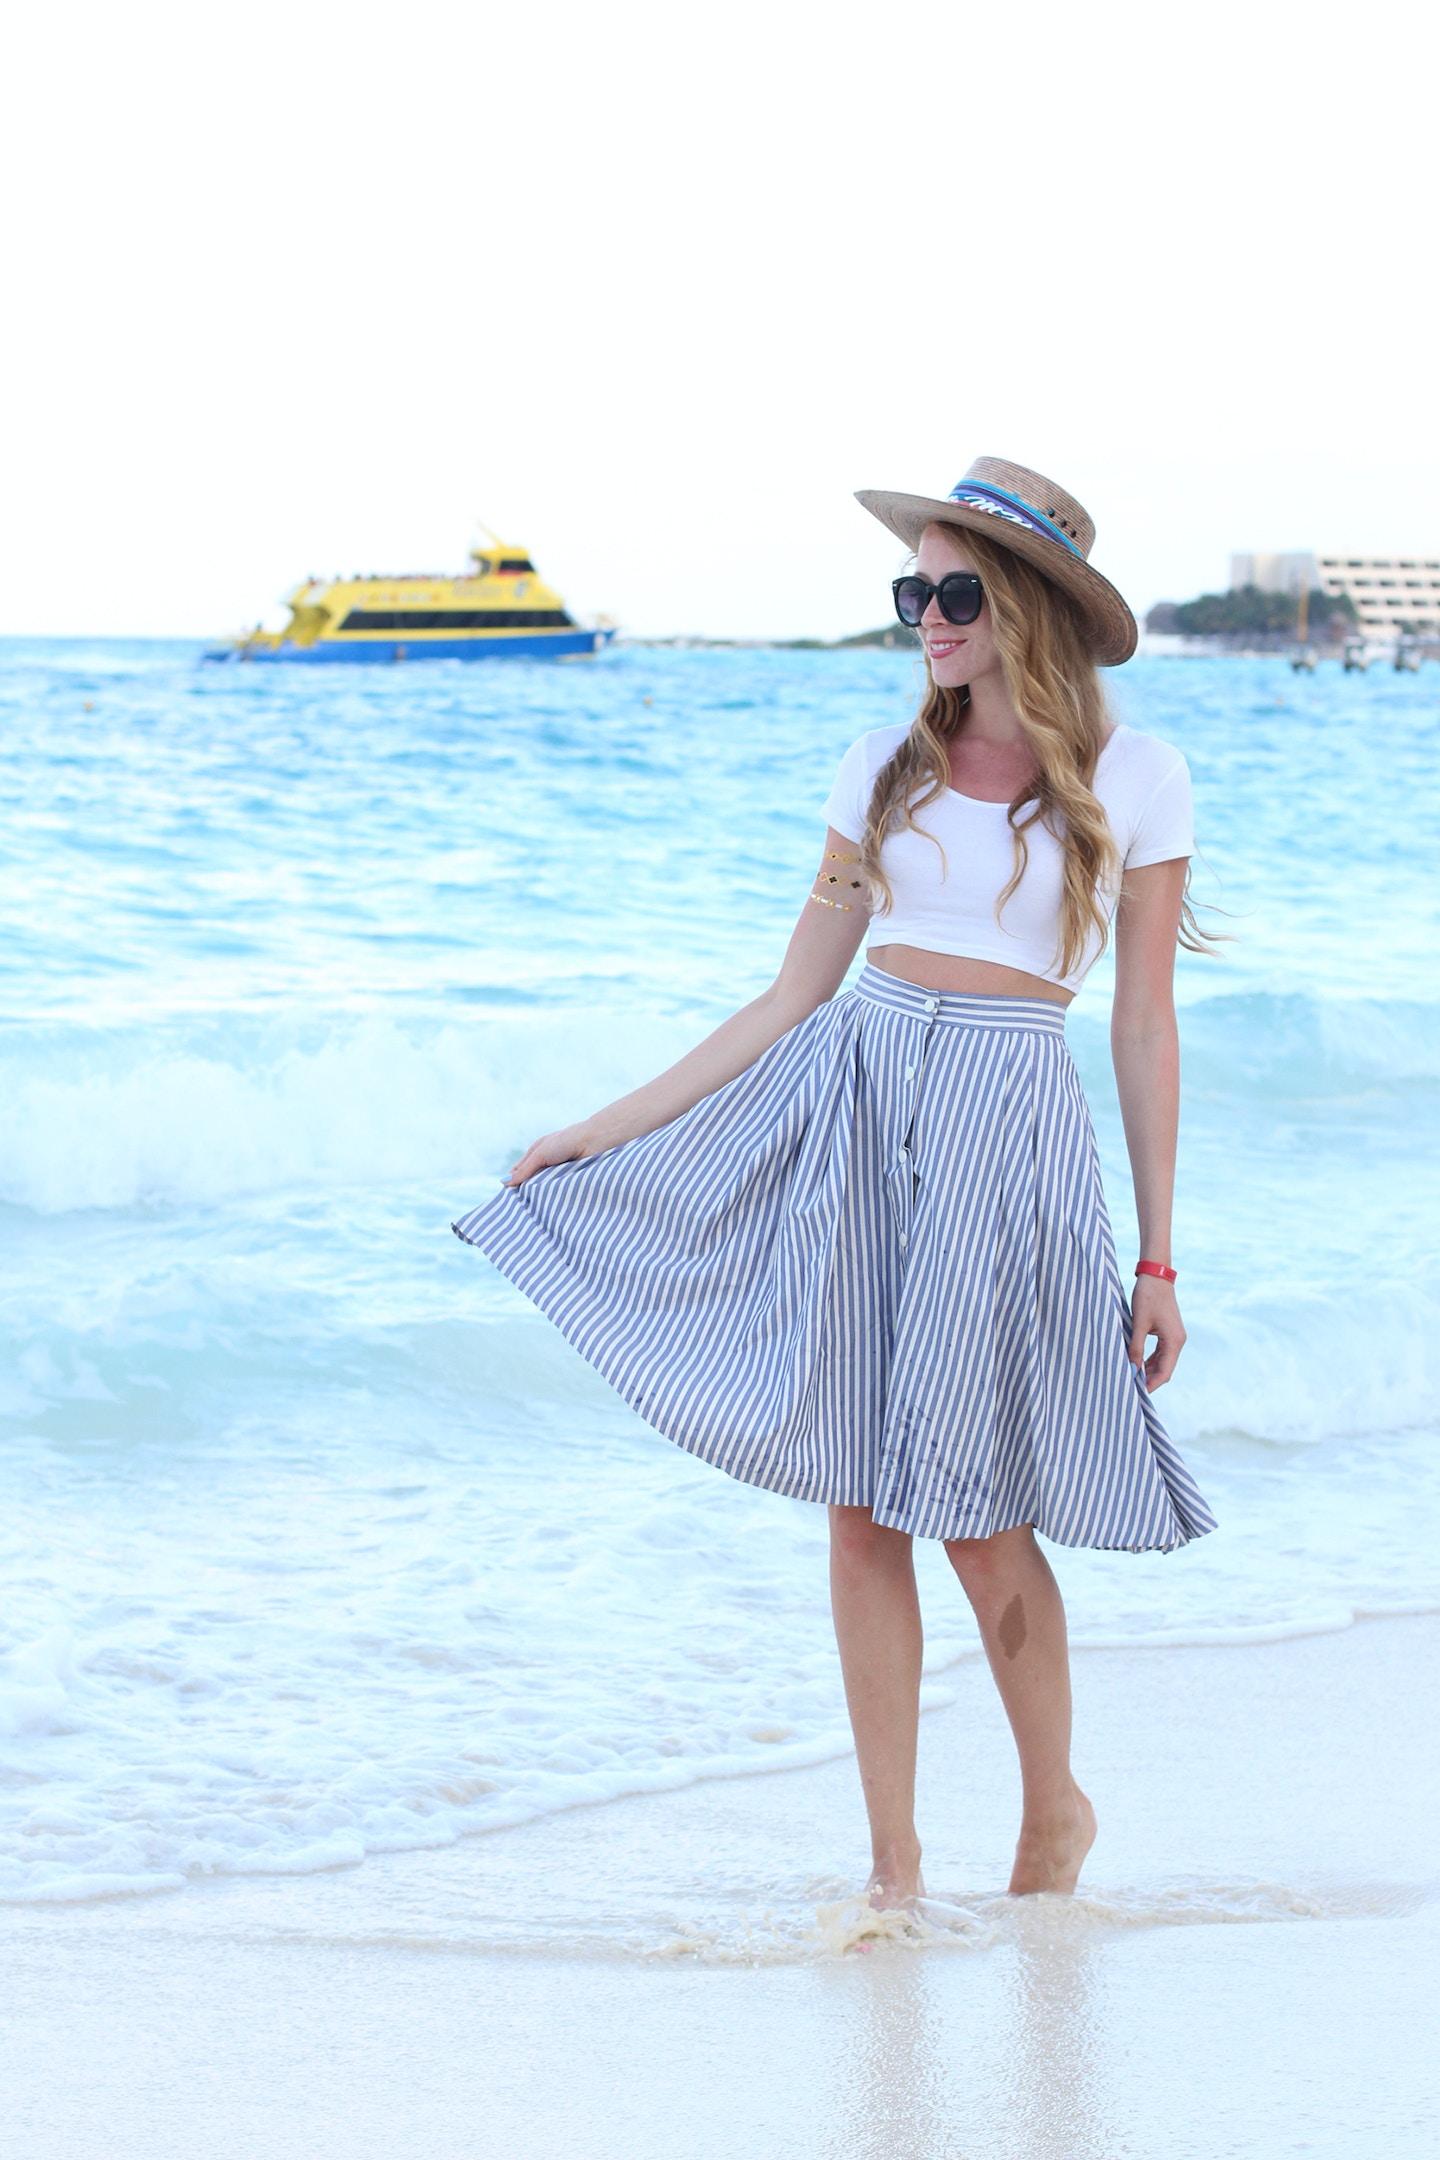 Seersucker skirt by the sea